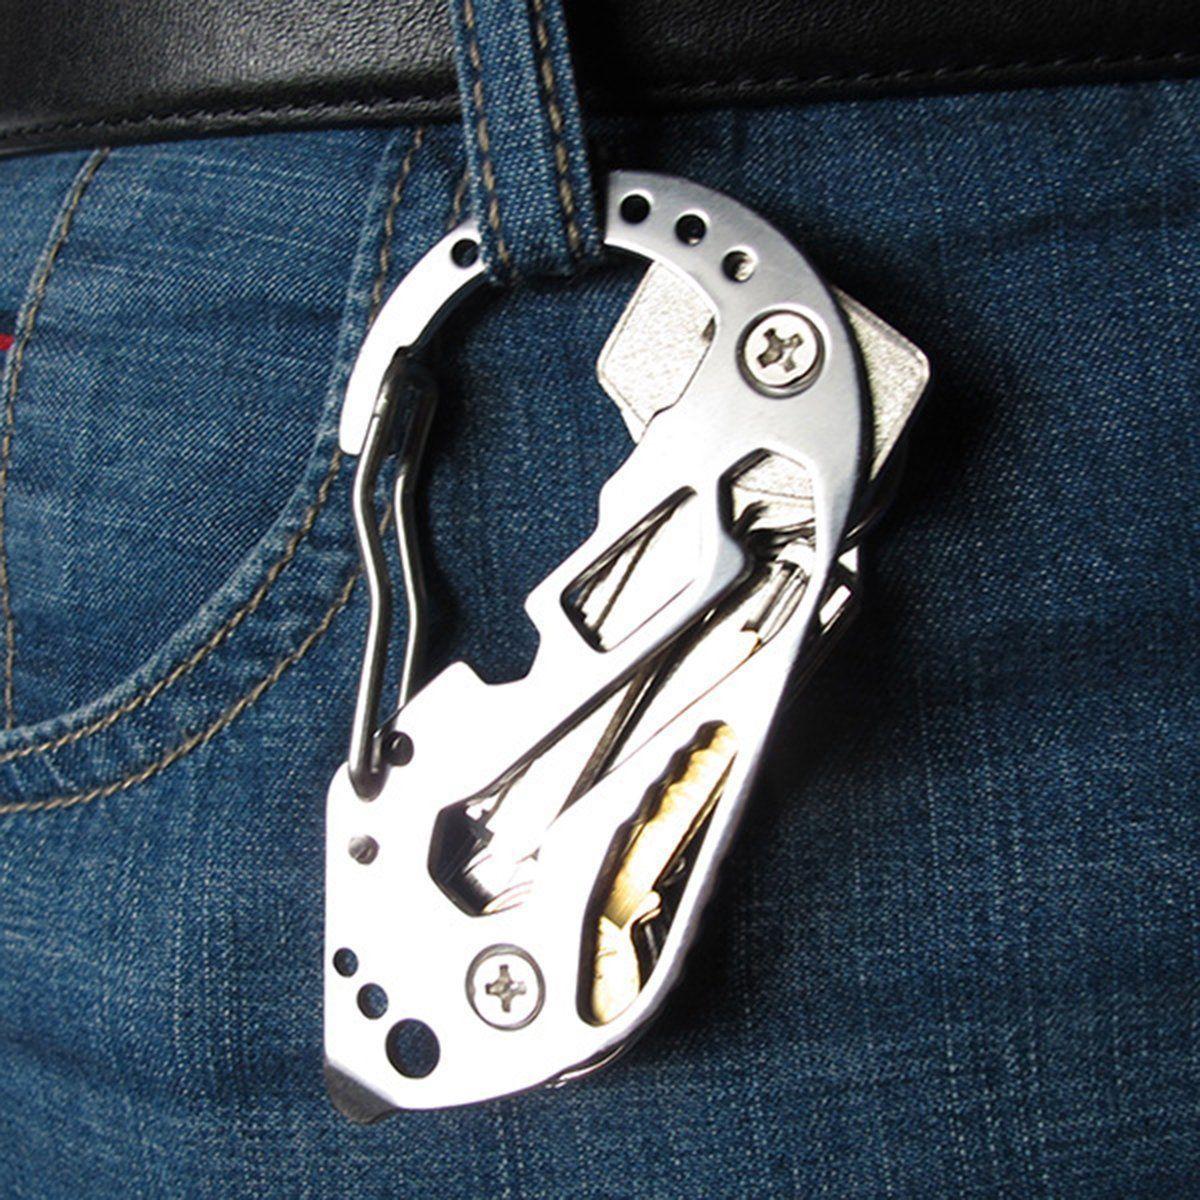 Edelstahl Multitool Schlüsselanhänger Karabiner Werkzeug Outdoor Camping EDC